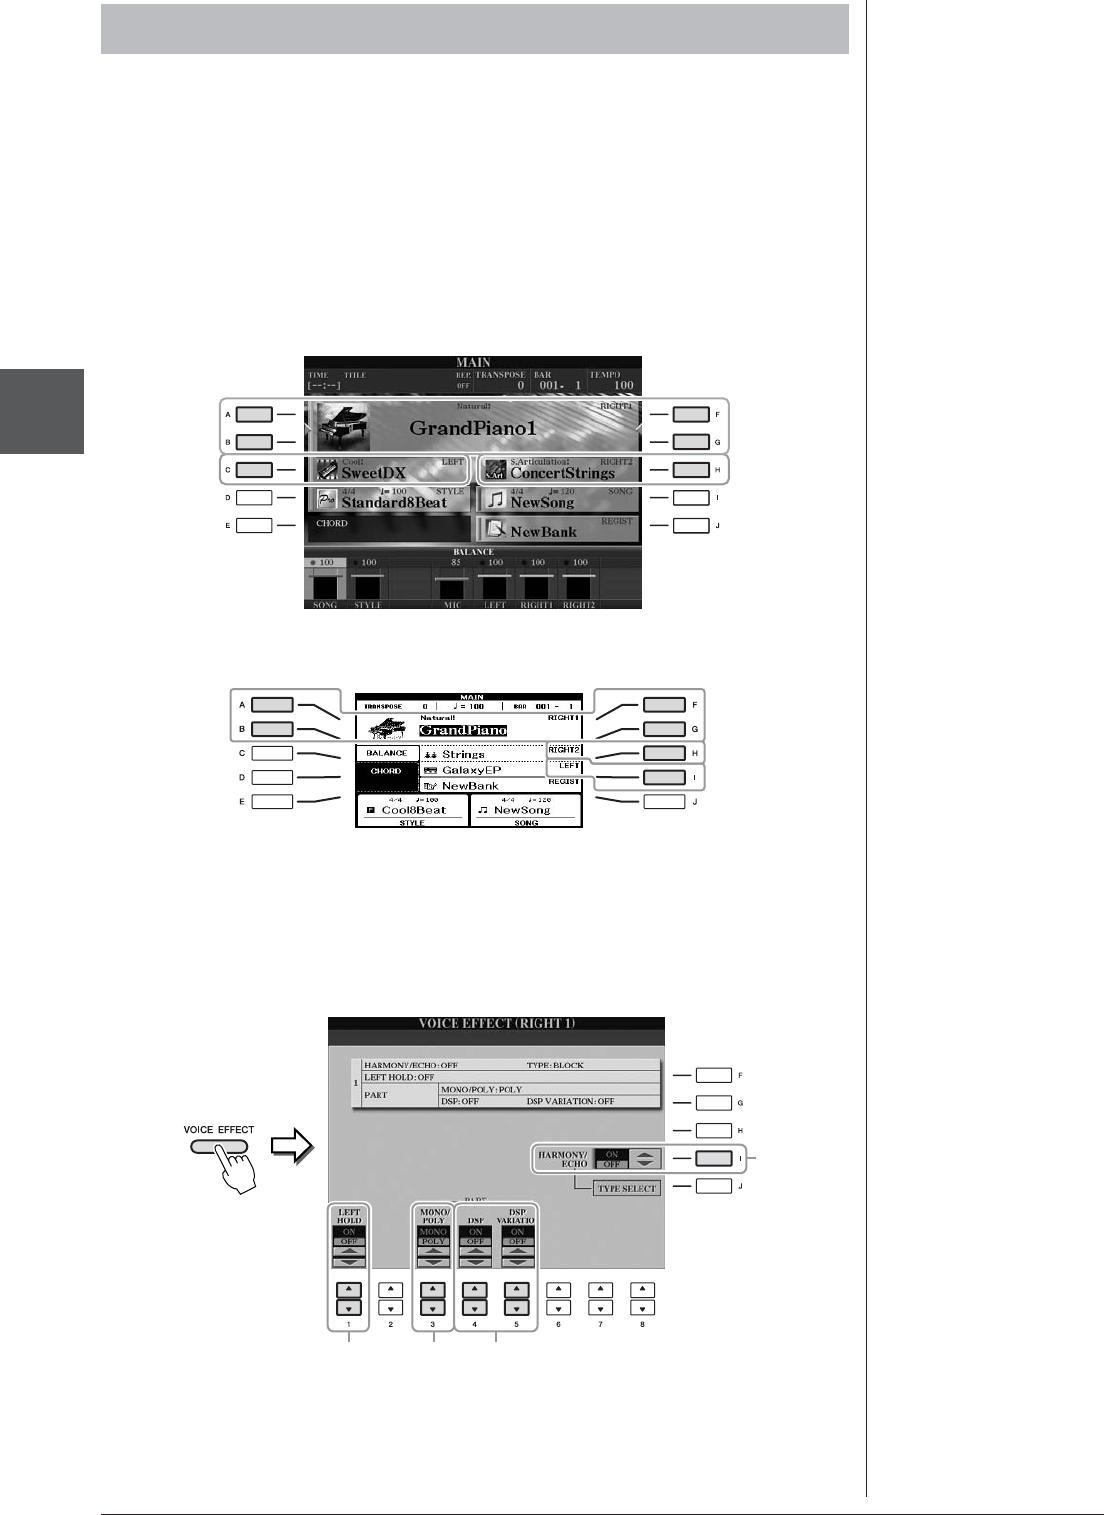 Yamaha Clavinova Cvp 505 Users Manual 509/505/503/501 Owner's